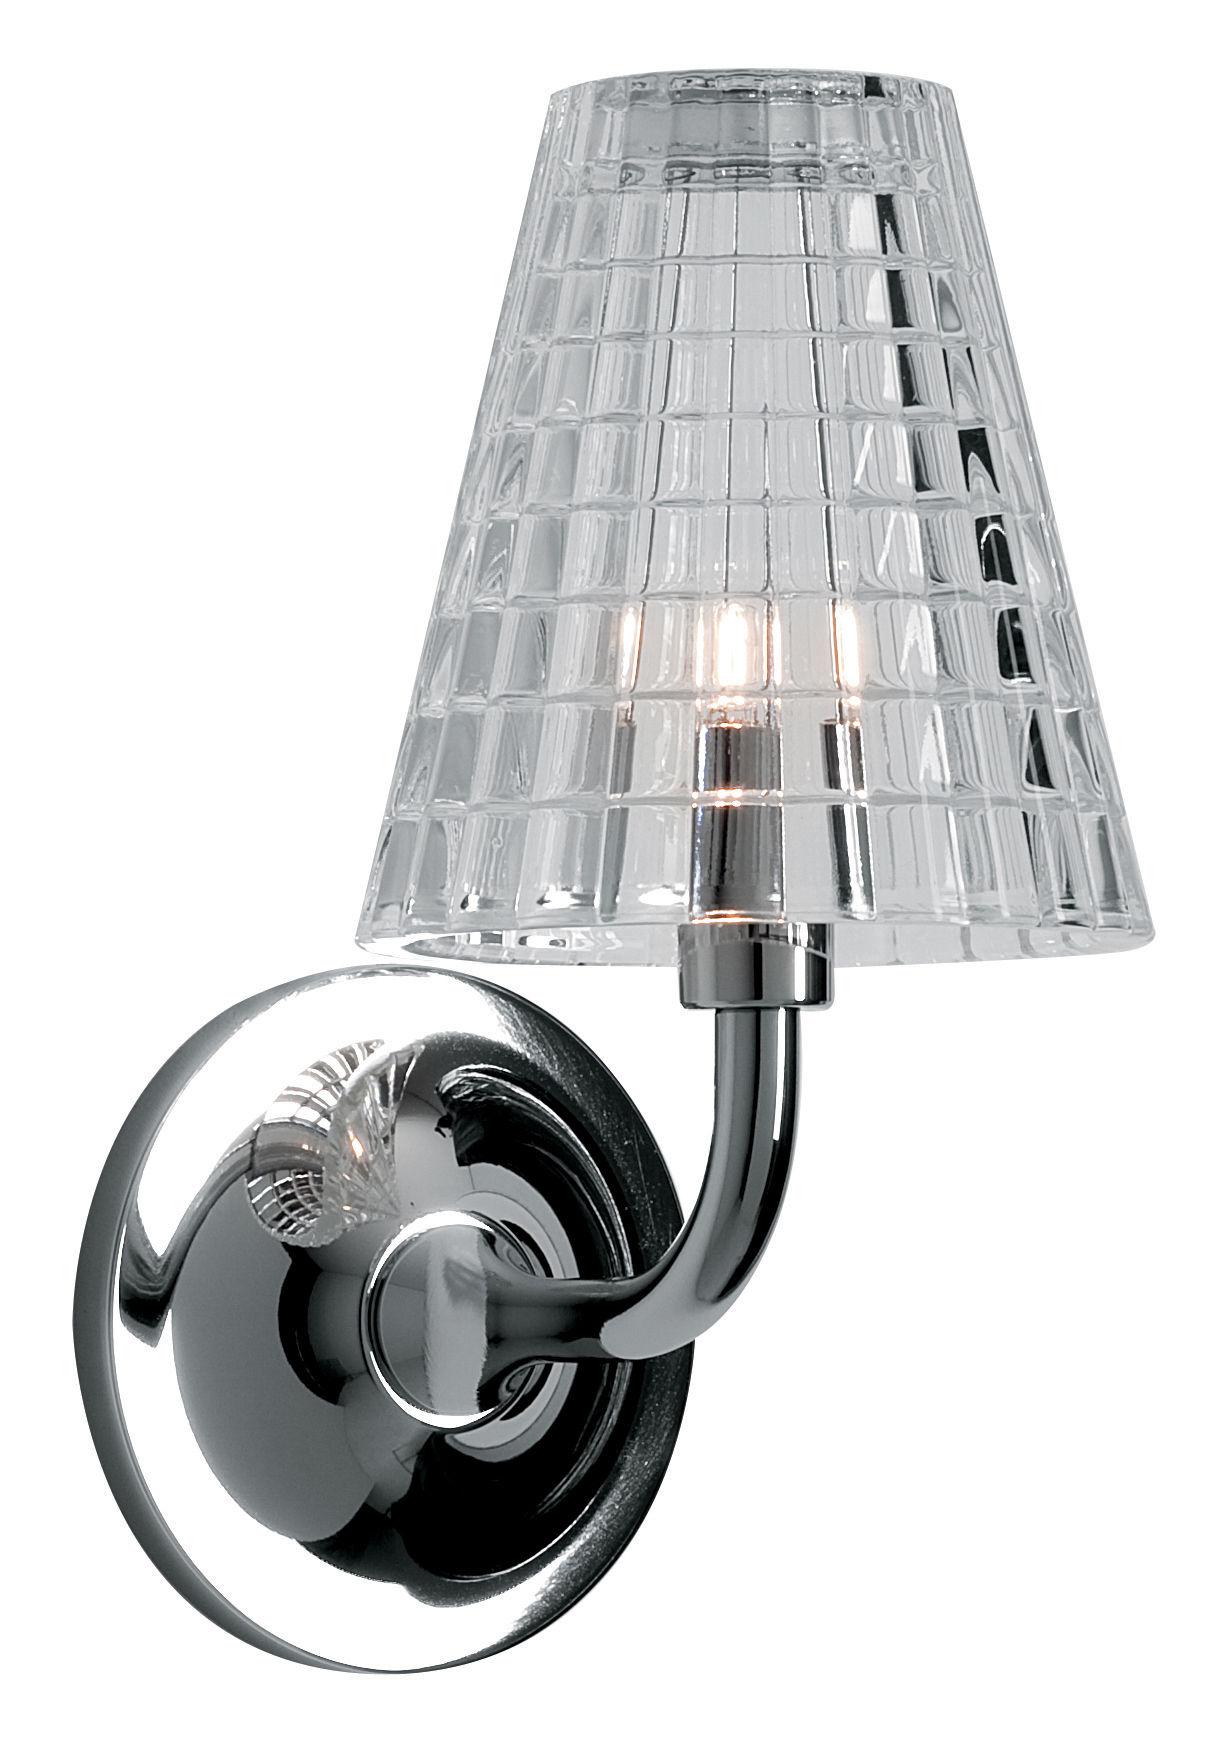 Lighting - Wall Lights - Flow Wall light by Fabbian - Transparent - Chromed metal, Glass